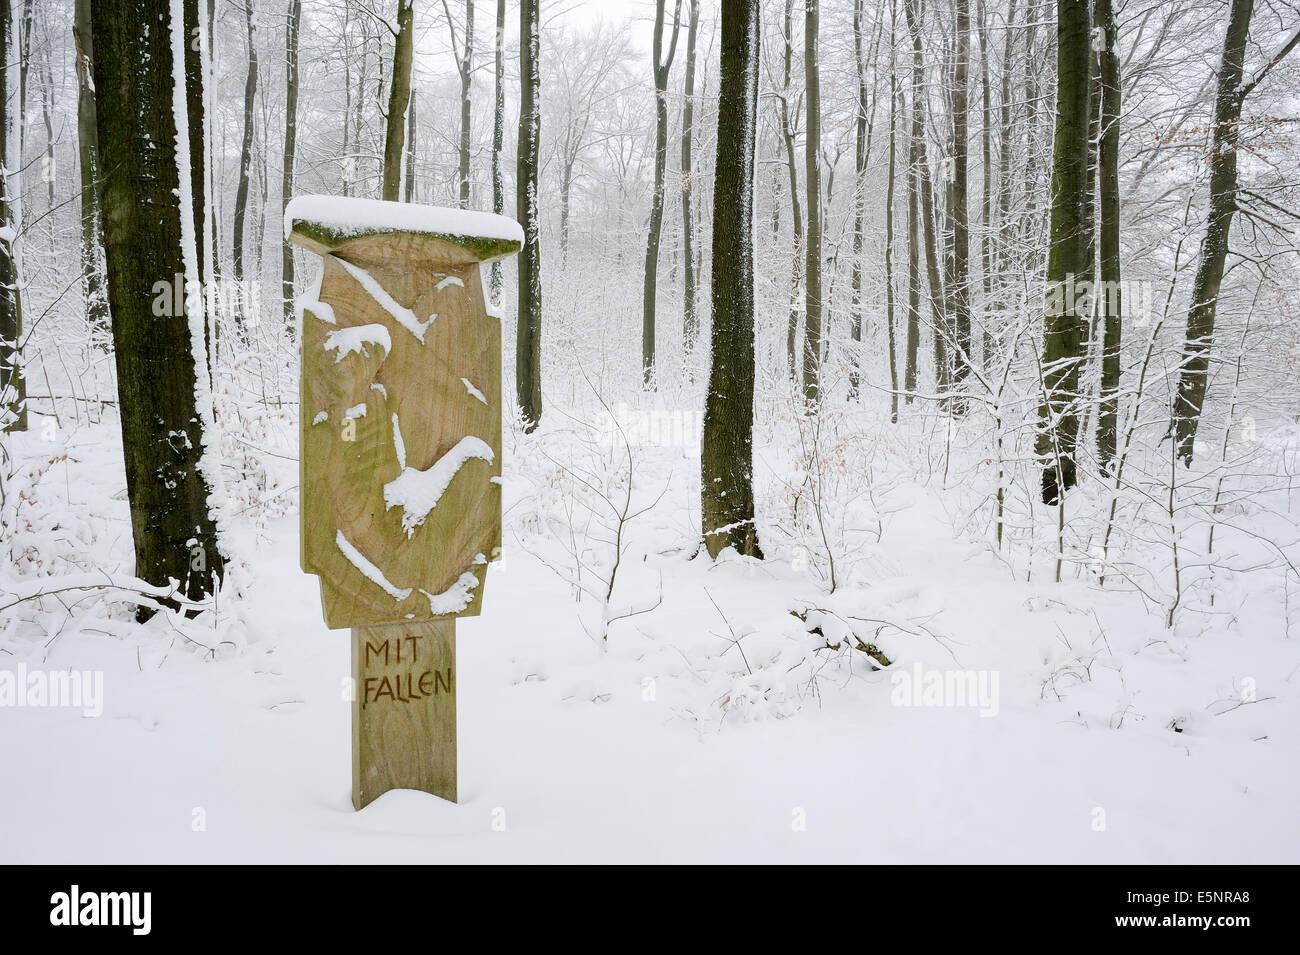 Way of the cross in winter, Baumberge, Munsterland, North Rhine-Westphalia, Germany - Stock Image